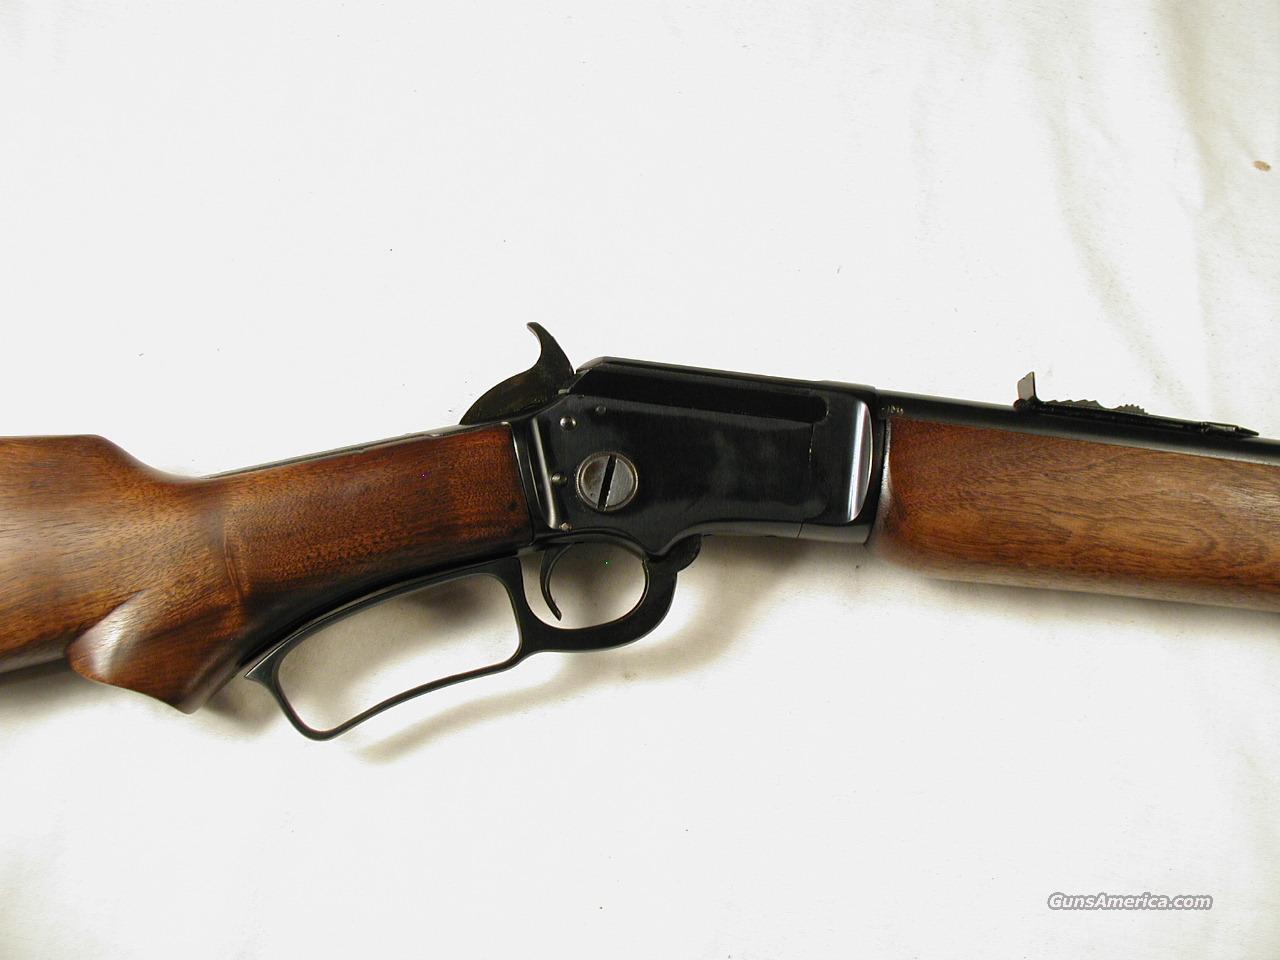 MARLIN 39  Guns > Rifles > Marlin Rifles > Modern > Lever Action